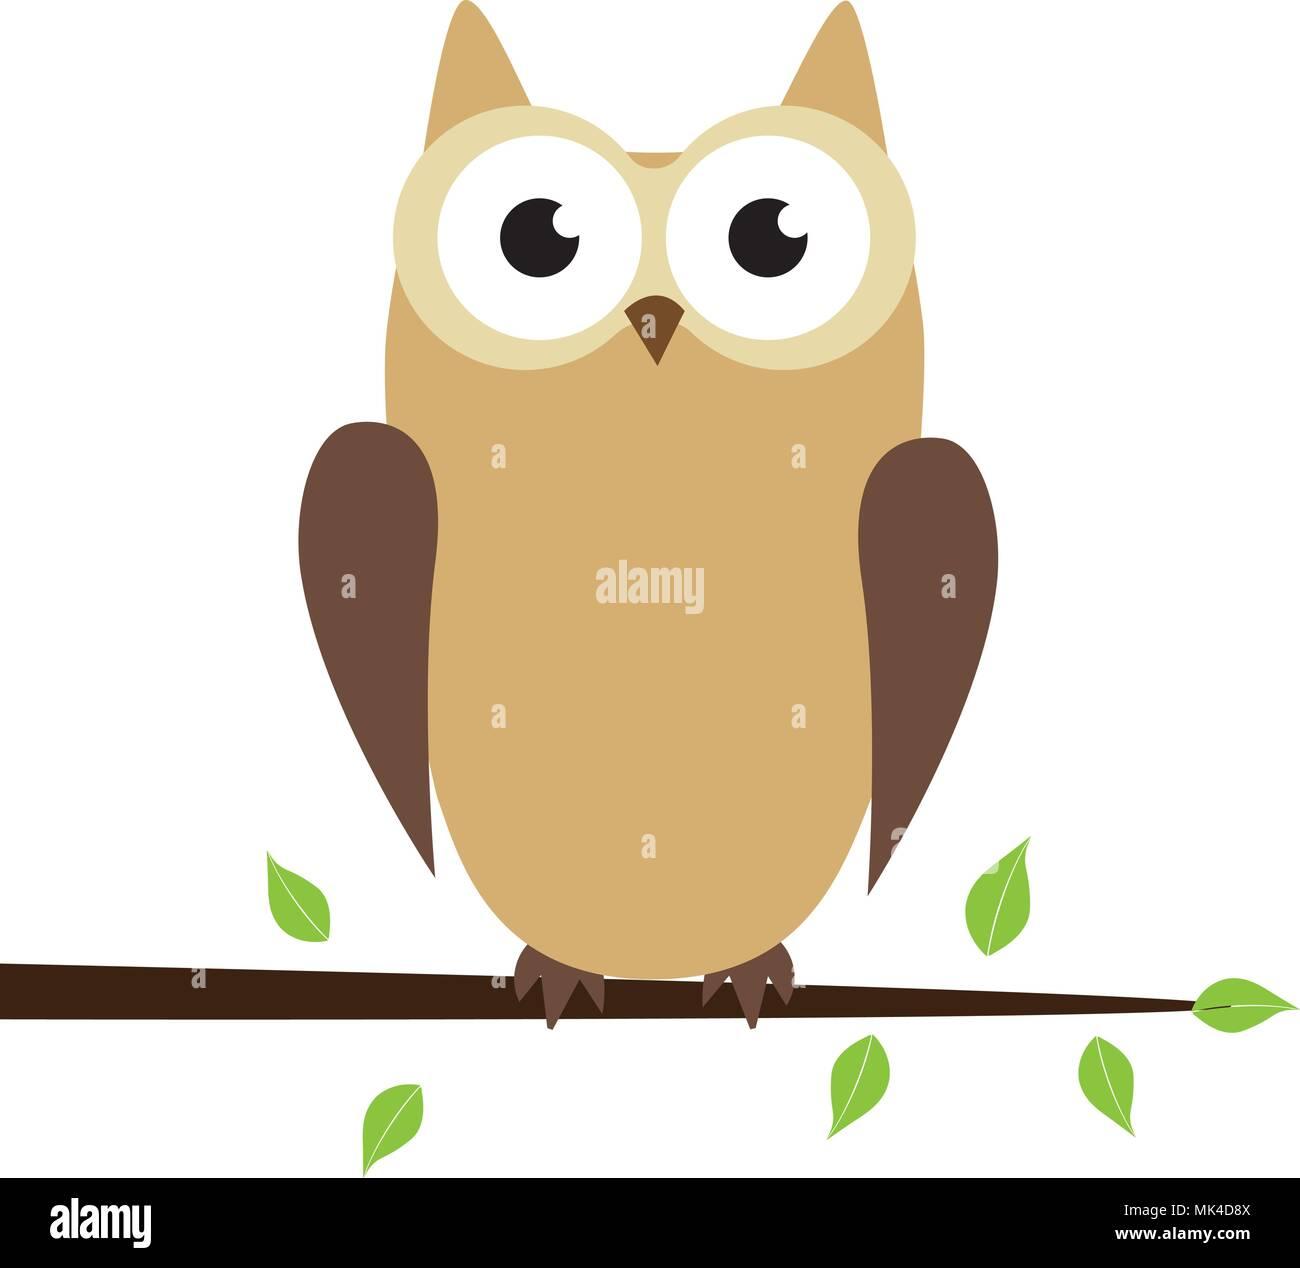 Vector illustration of cute cartoon owl vector designs for baby vector illustration of cute cartoon owl vector designs for baby showers birthdays and invitation stopboris Choice Image